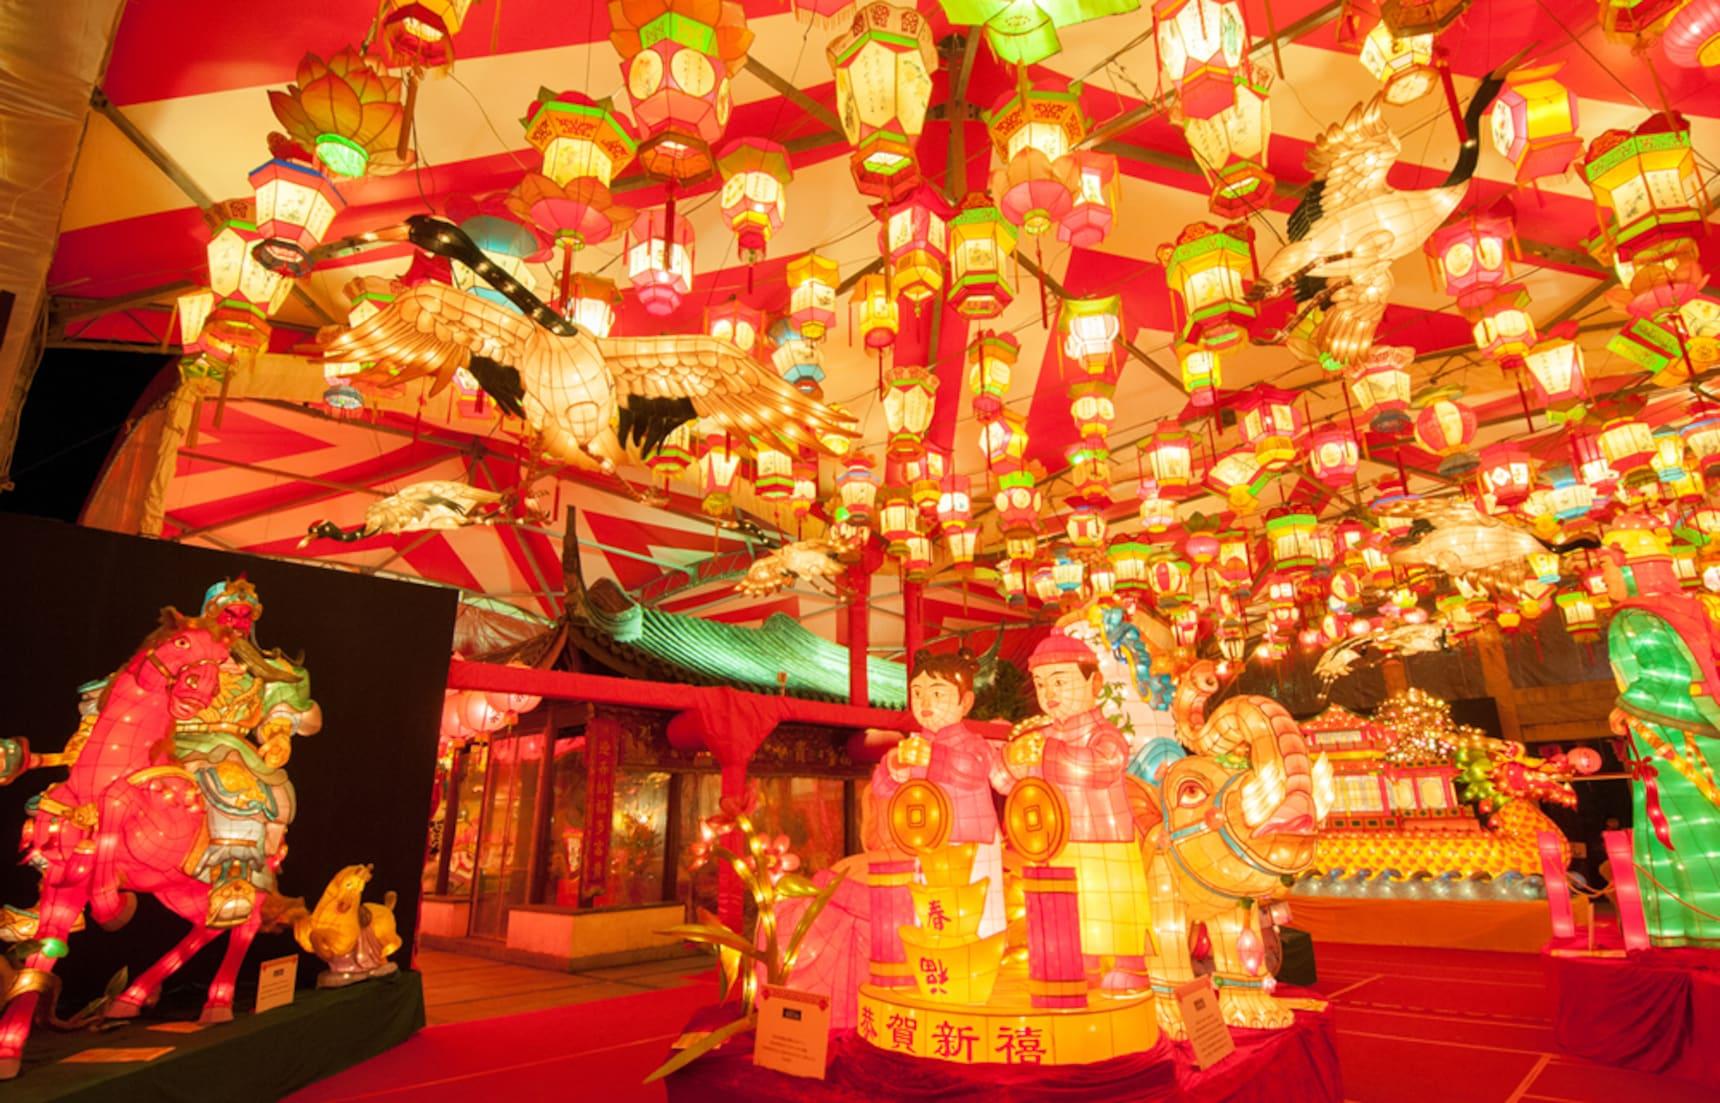 Nagasaki Lantern Festival เทศกาลโคมสุดอลังการ